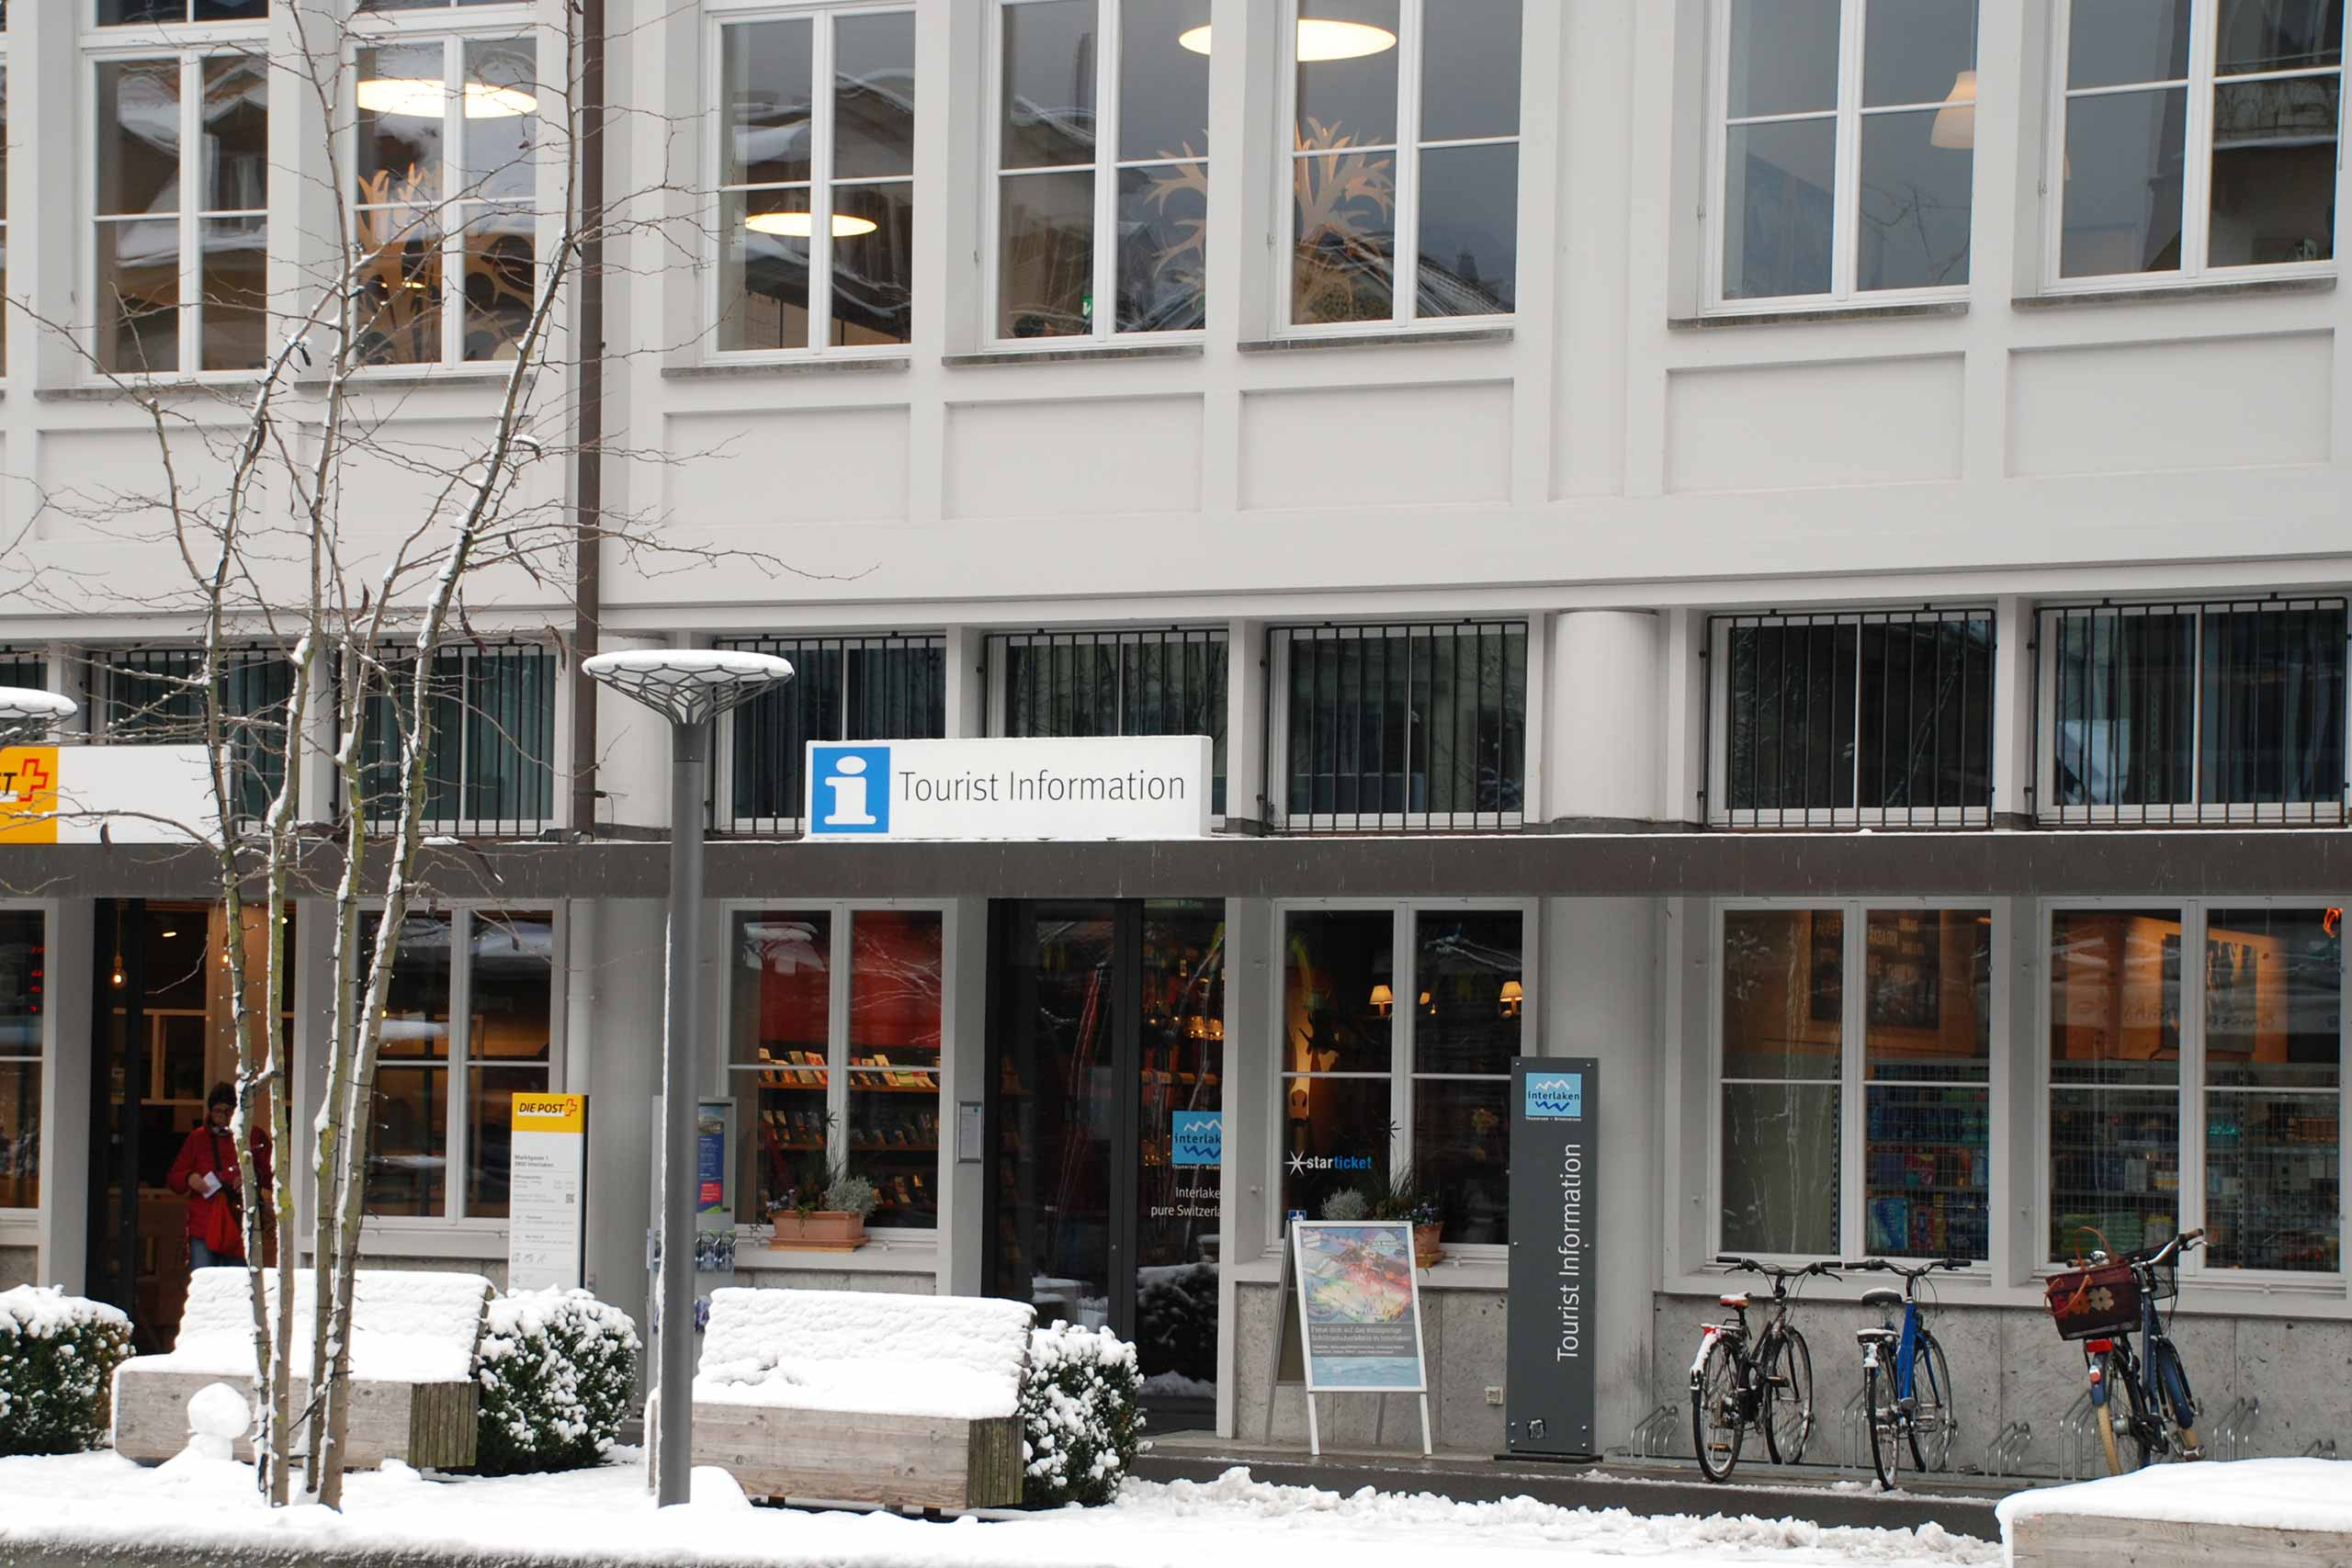 interlaken-tourismus-buero-fassade-winter